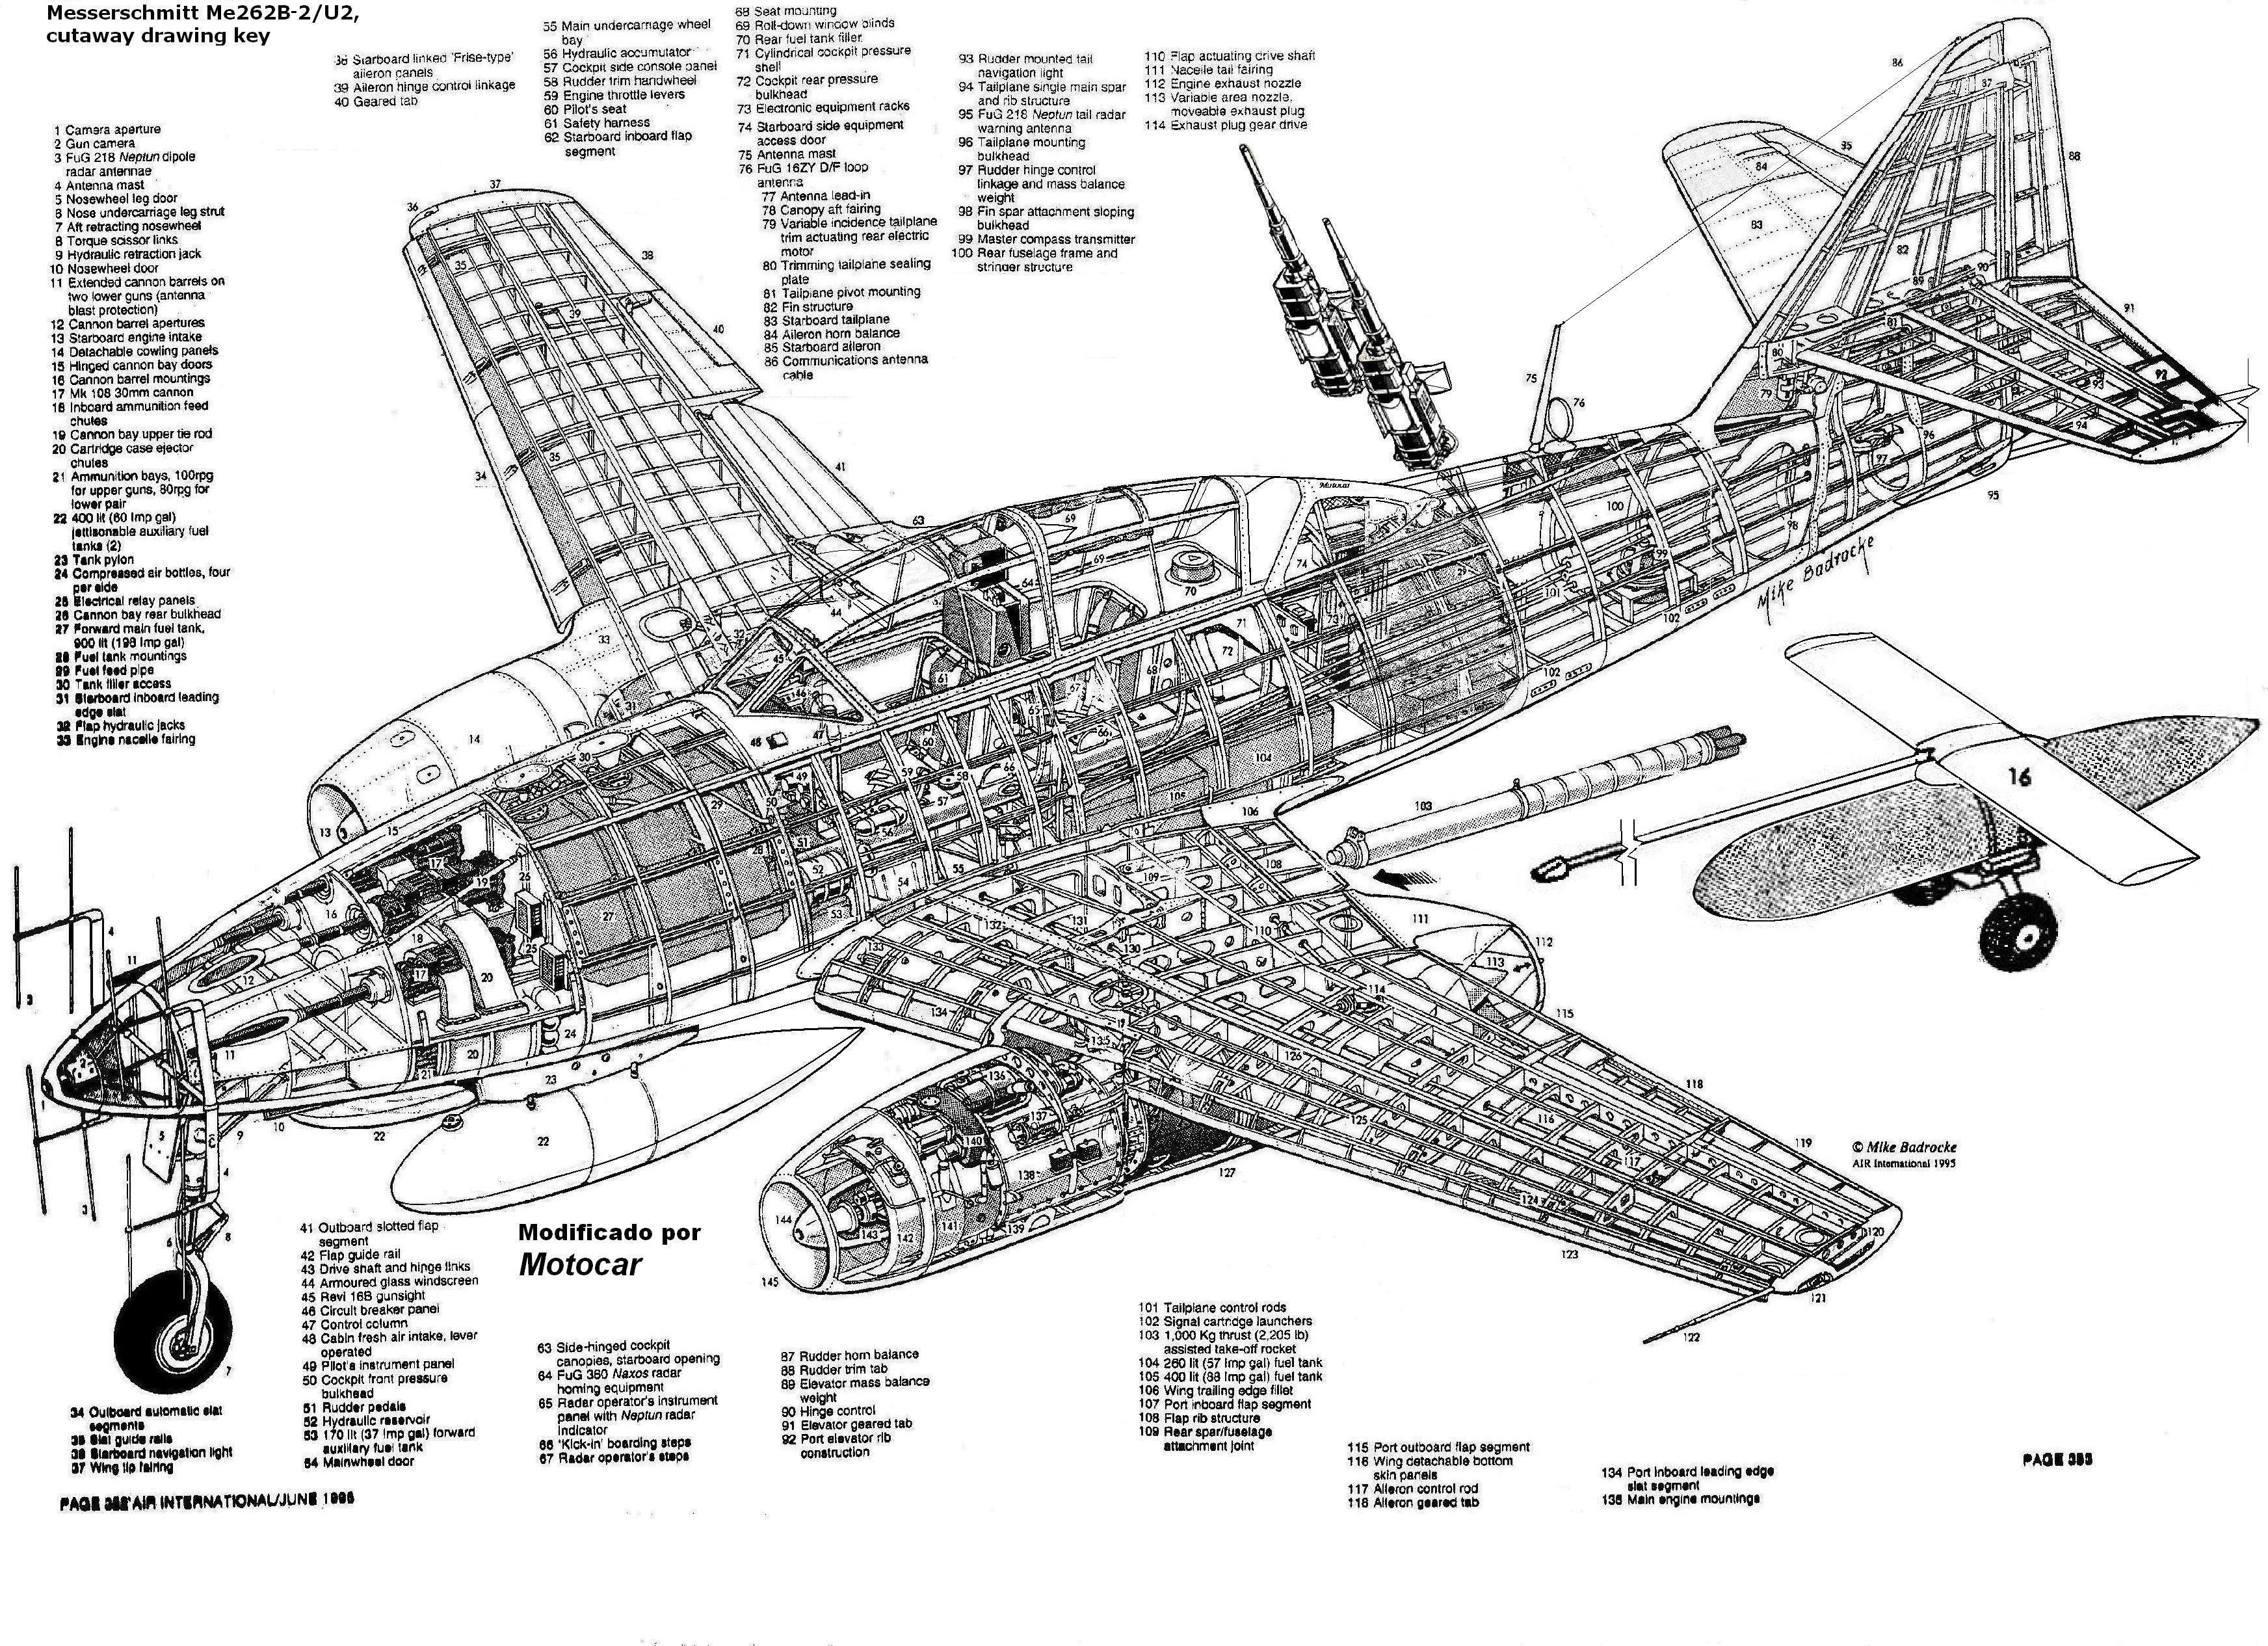 Me 262 Variant